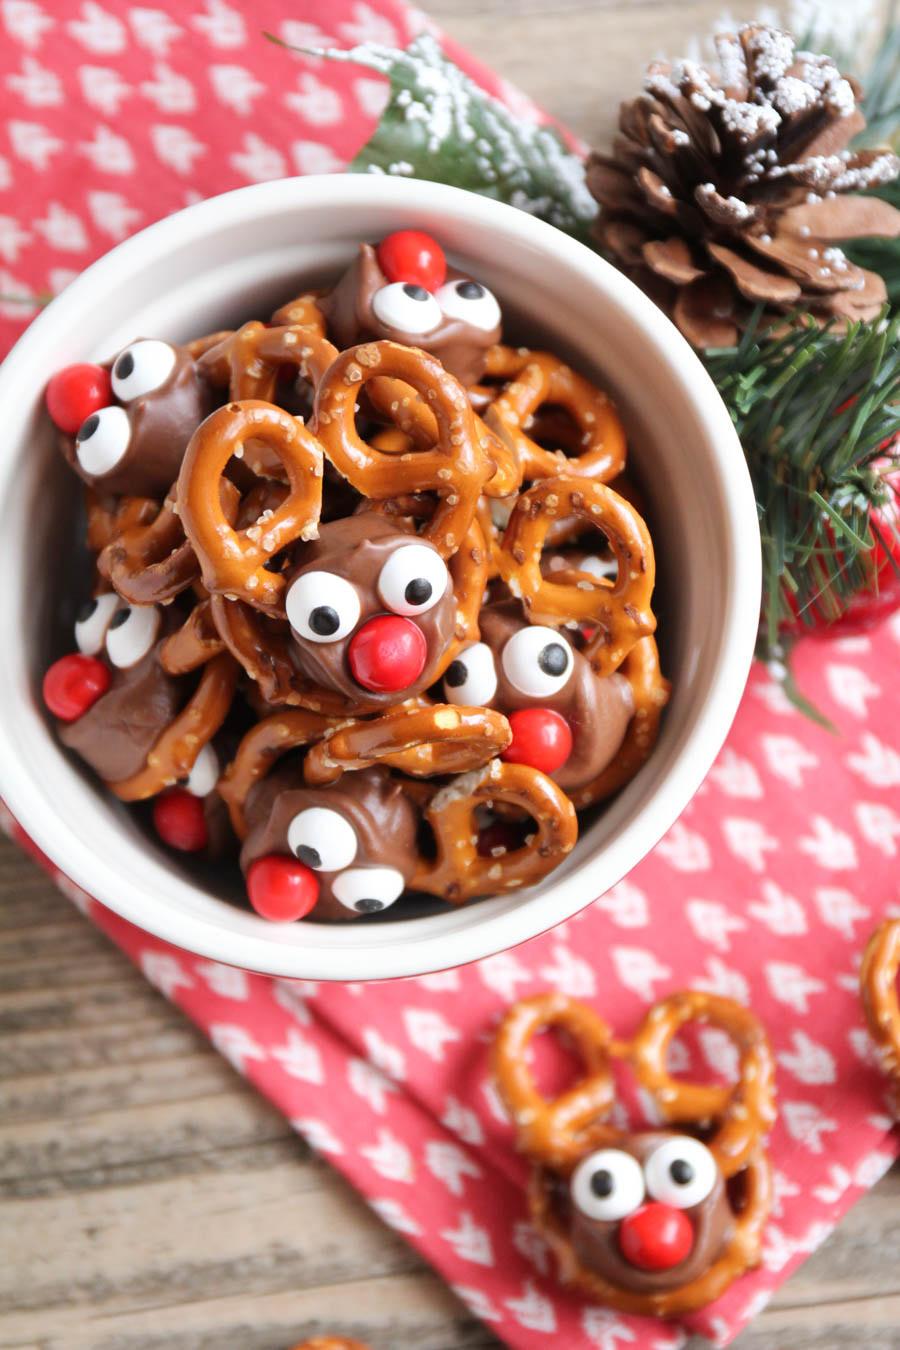 pretzel christmas treats candy reindeer rolo holiday gifts edible fun easy recipes treat cute rudolf crafts raindeer food chocolate recipe